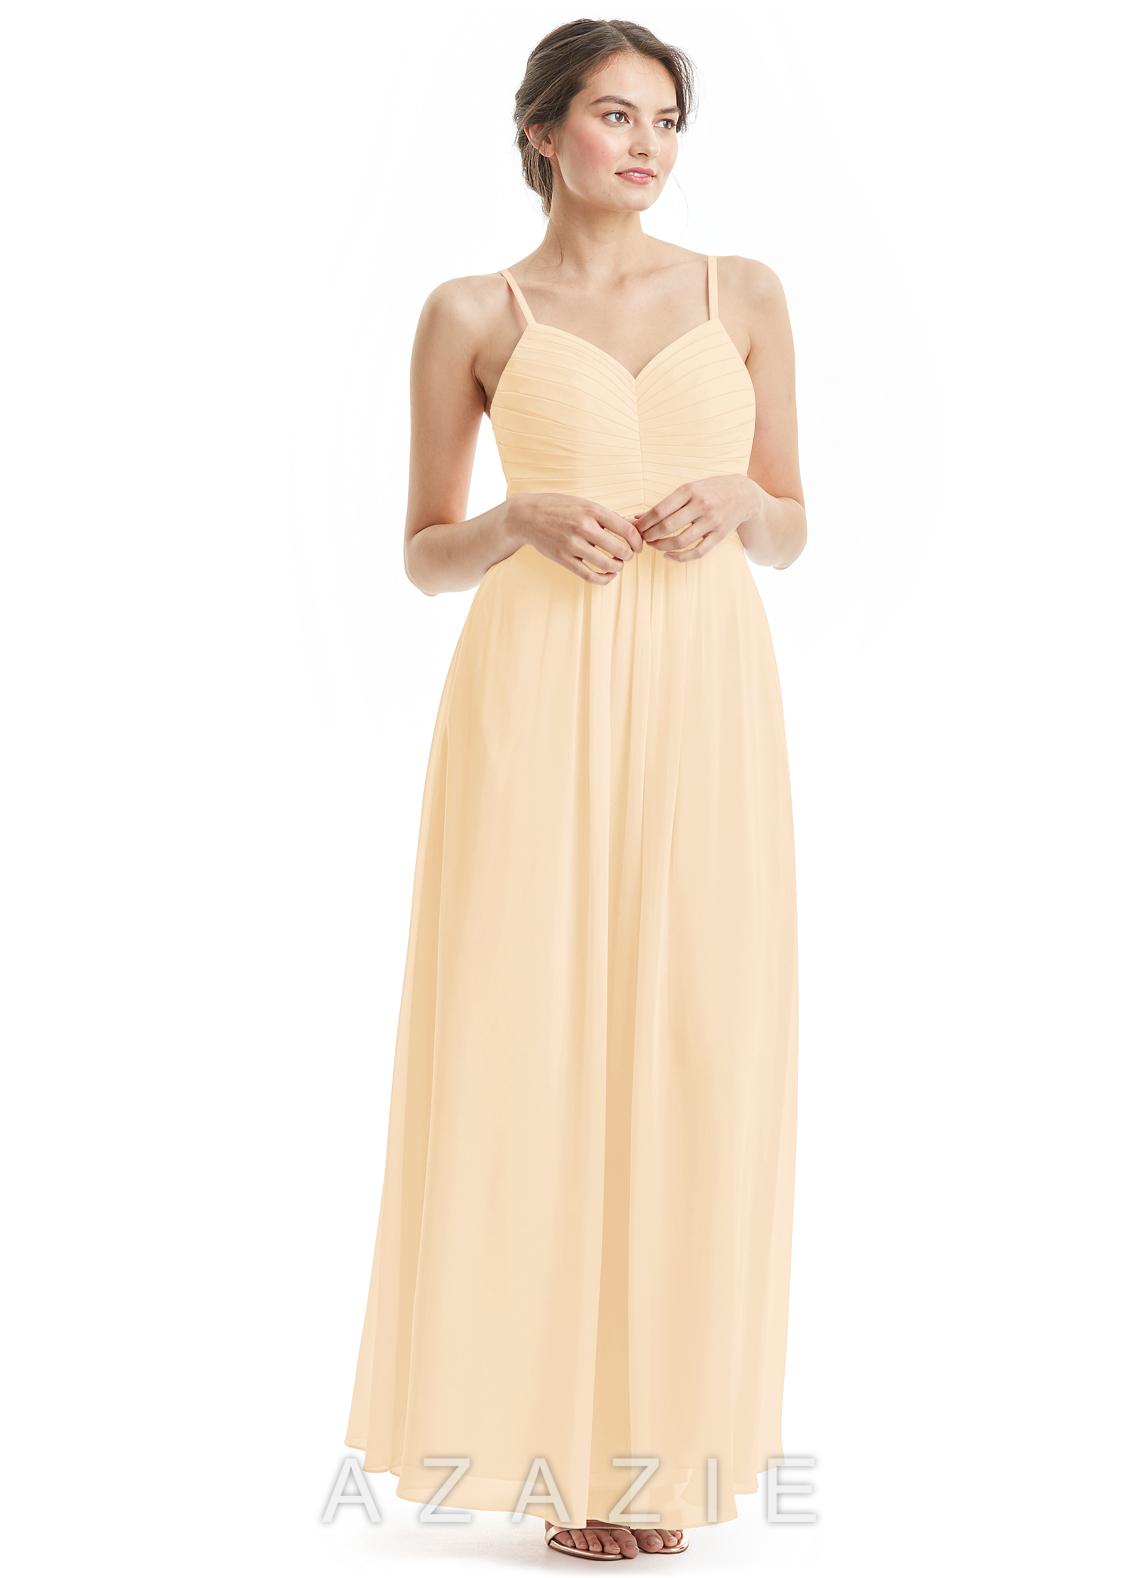 Peach bridesmaid dresses peach gowns azazie azazie paola azazie paola ombrellifo Images